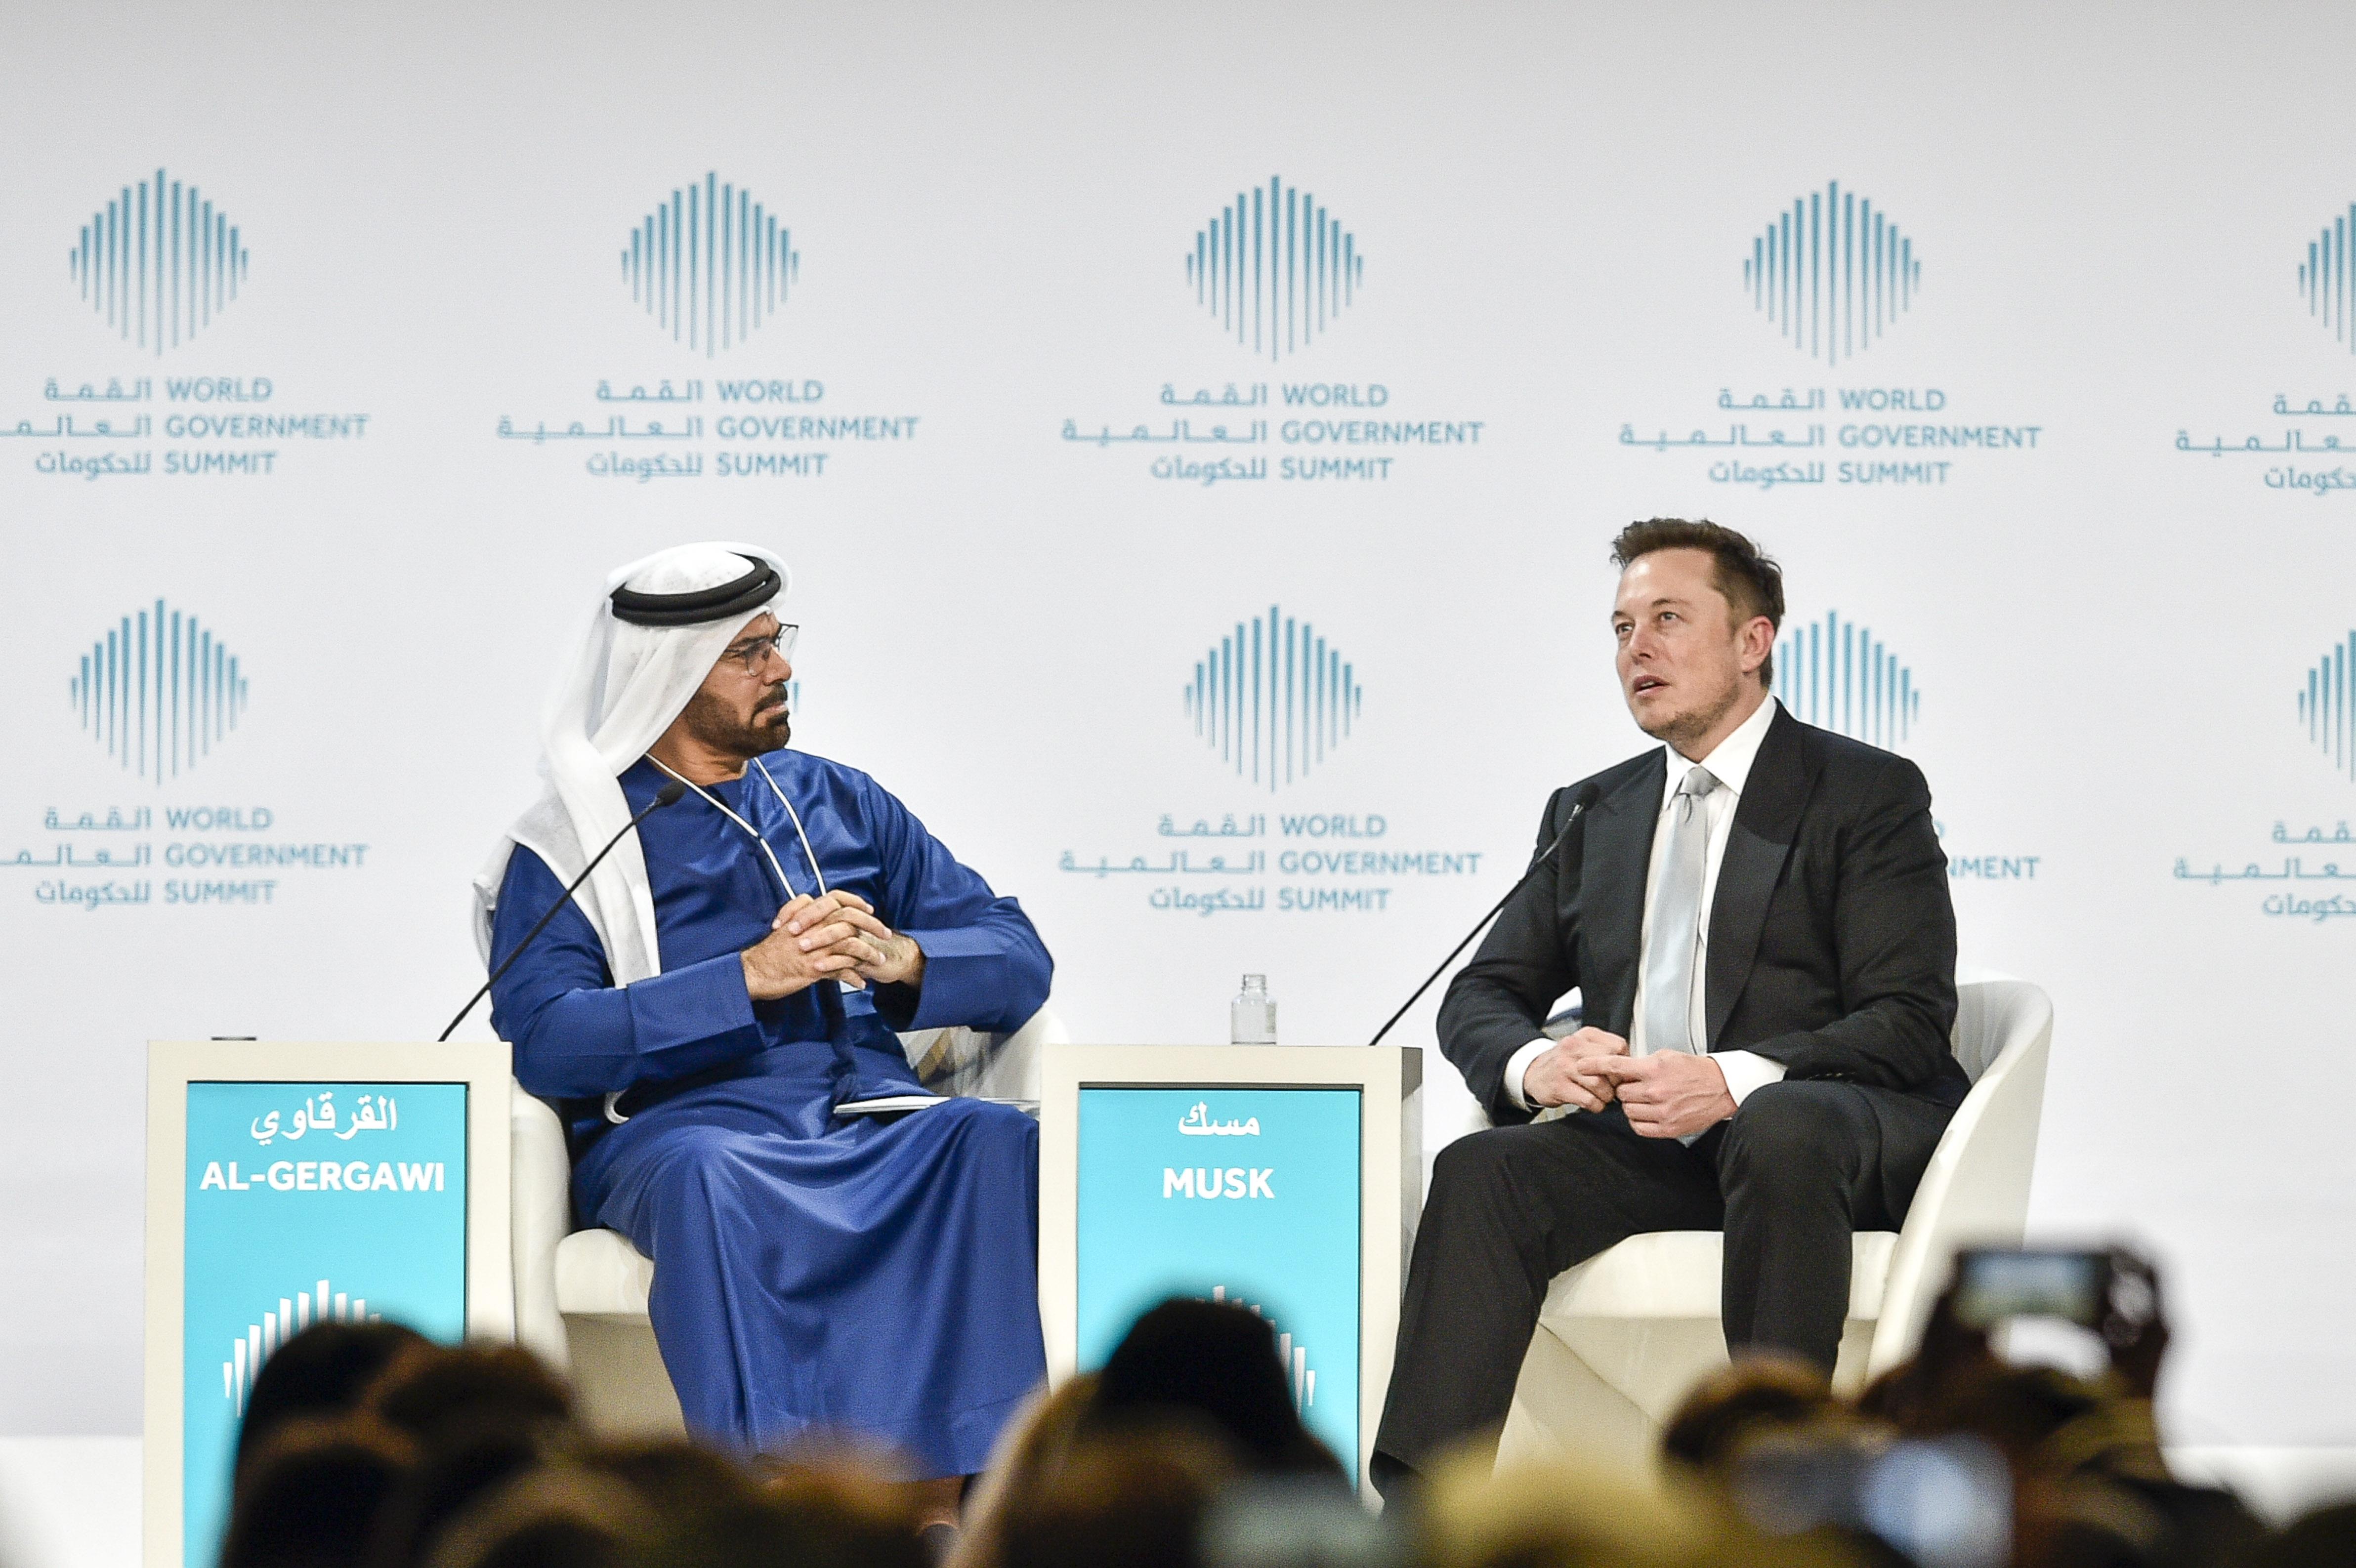 UAE-POLITICS-GOVERNMENT-SUMMIT-TECHNOLOGY-TRANSPORT